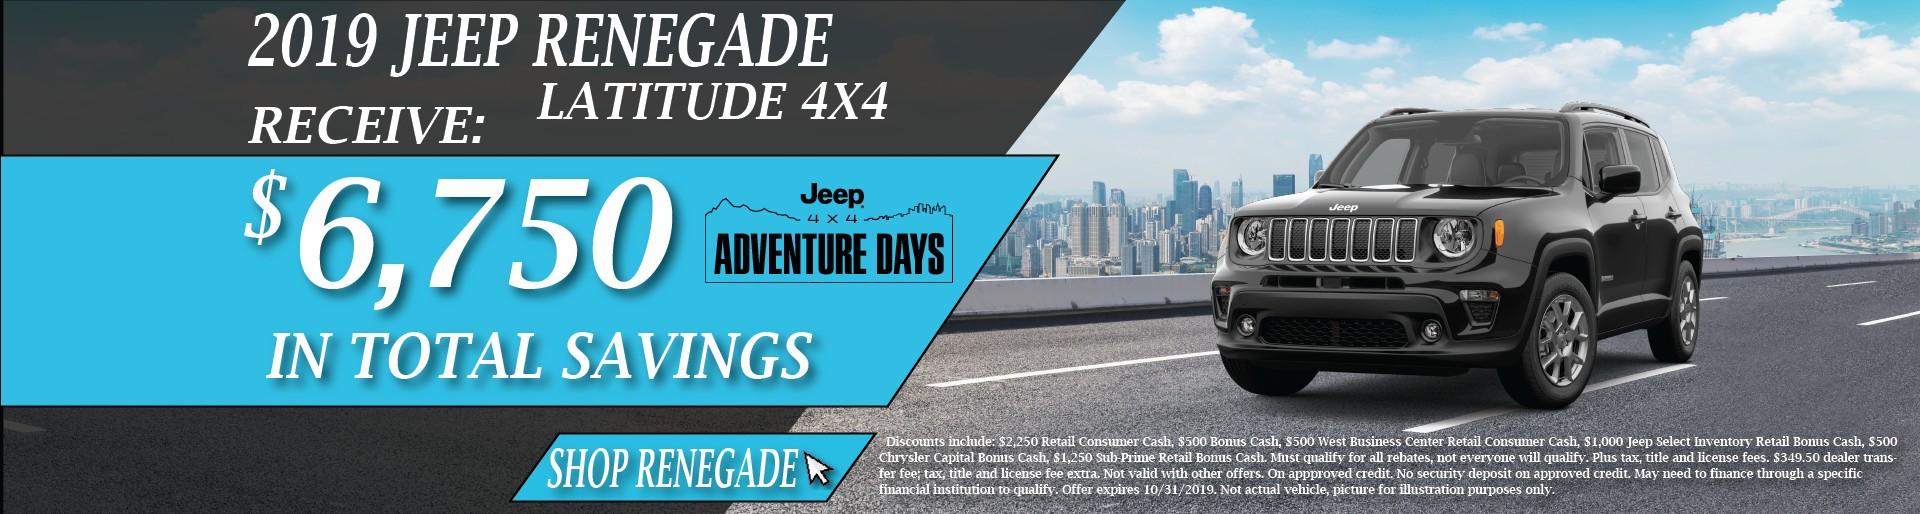 2019 Jeep Renegade October